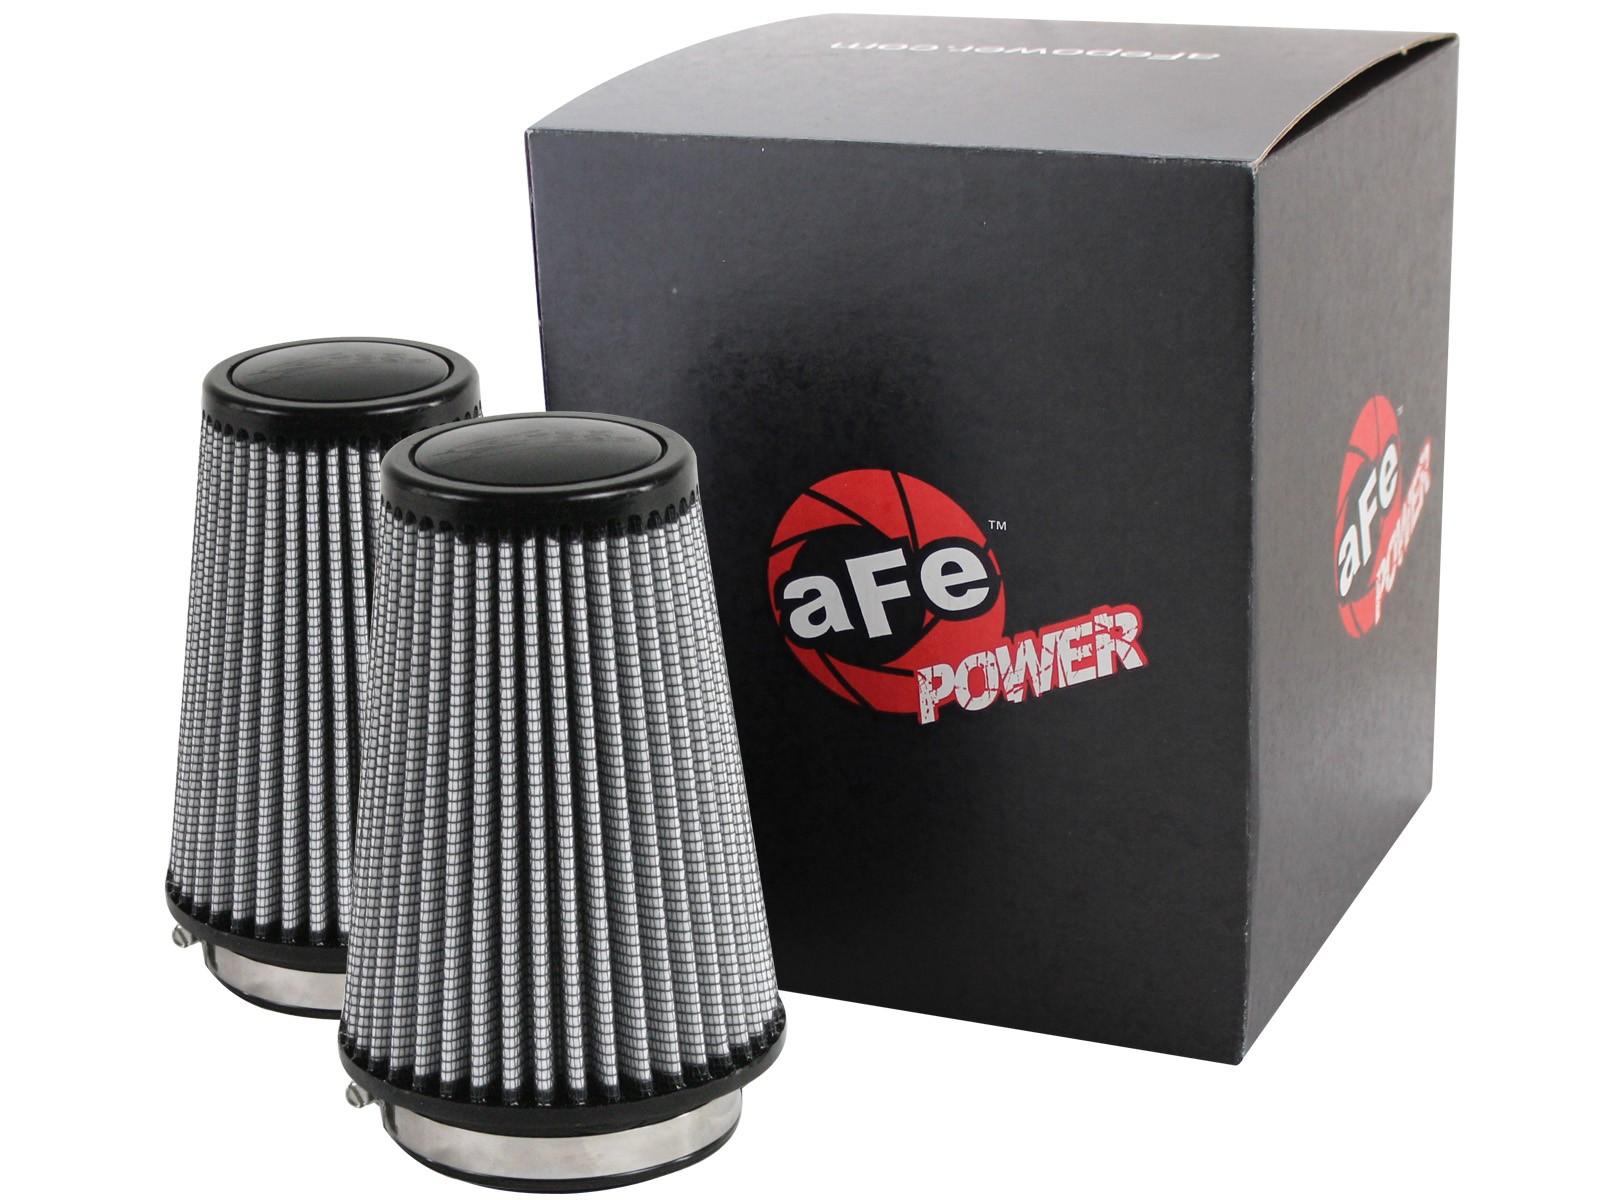 aFe POWER 21-90069M Magnum FLOW Pro DRY S Air Filter